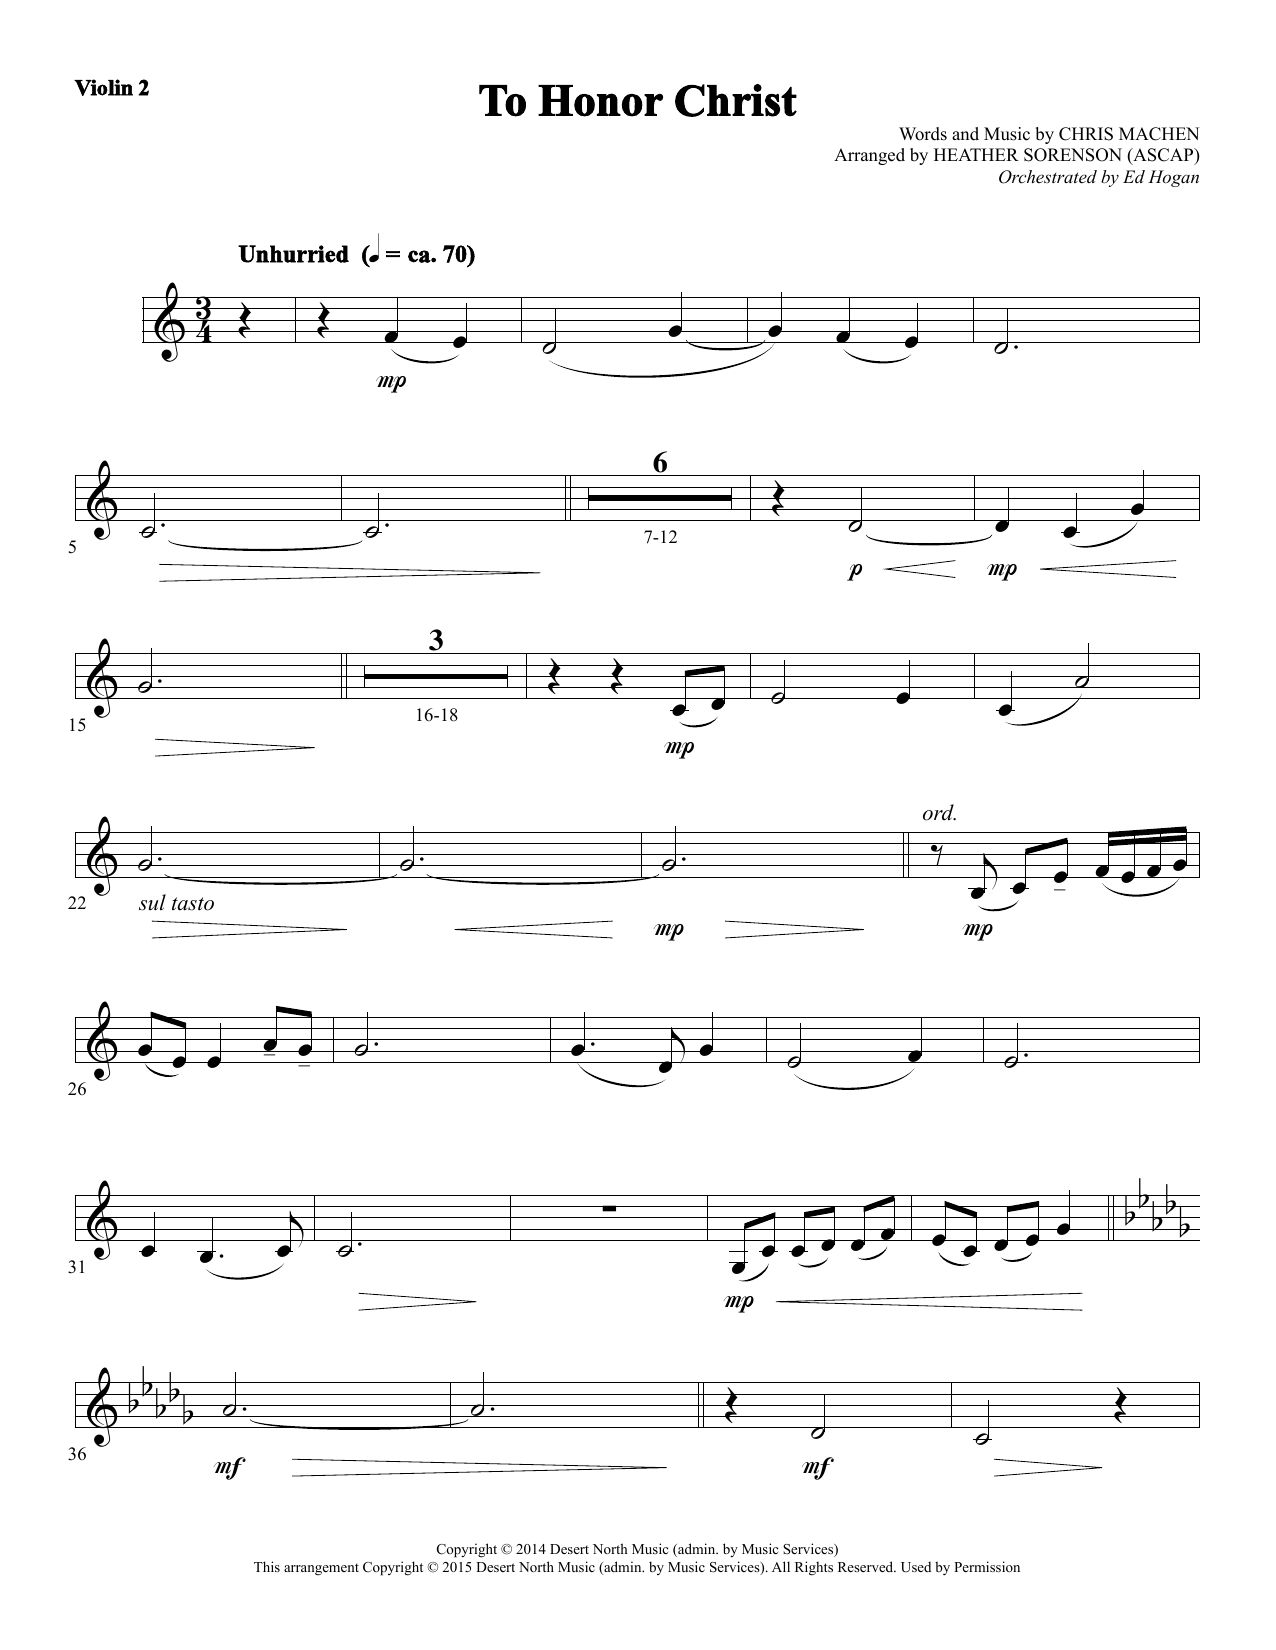 To Honor Christ - Violin 2 Sheet Music